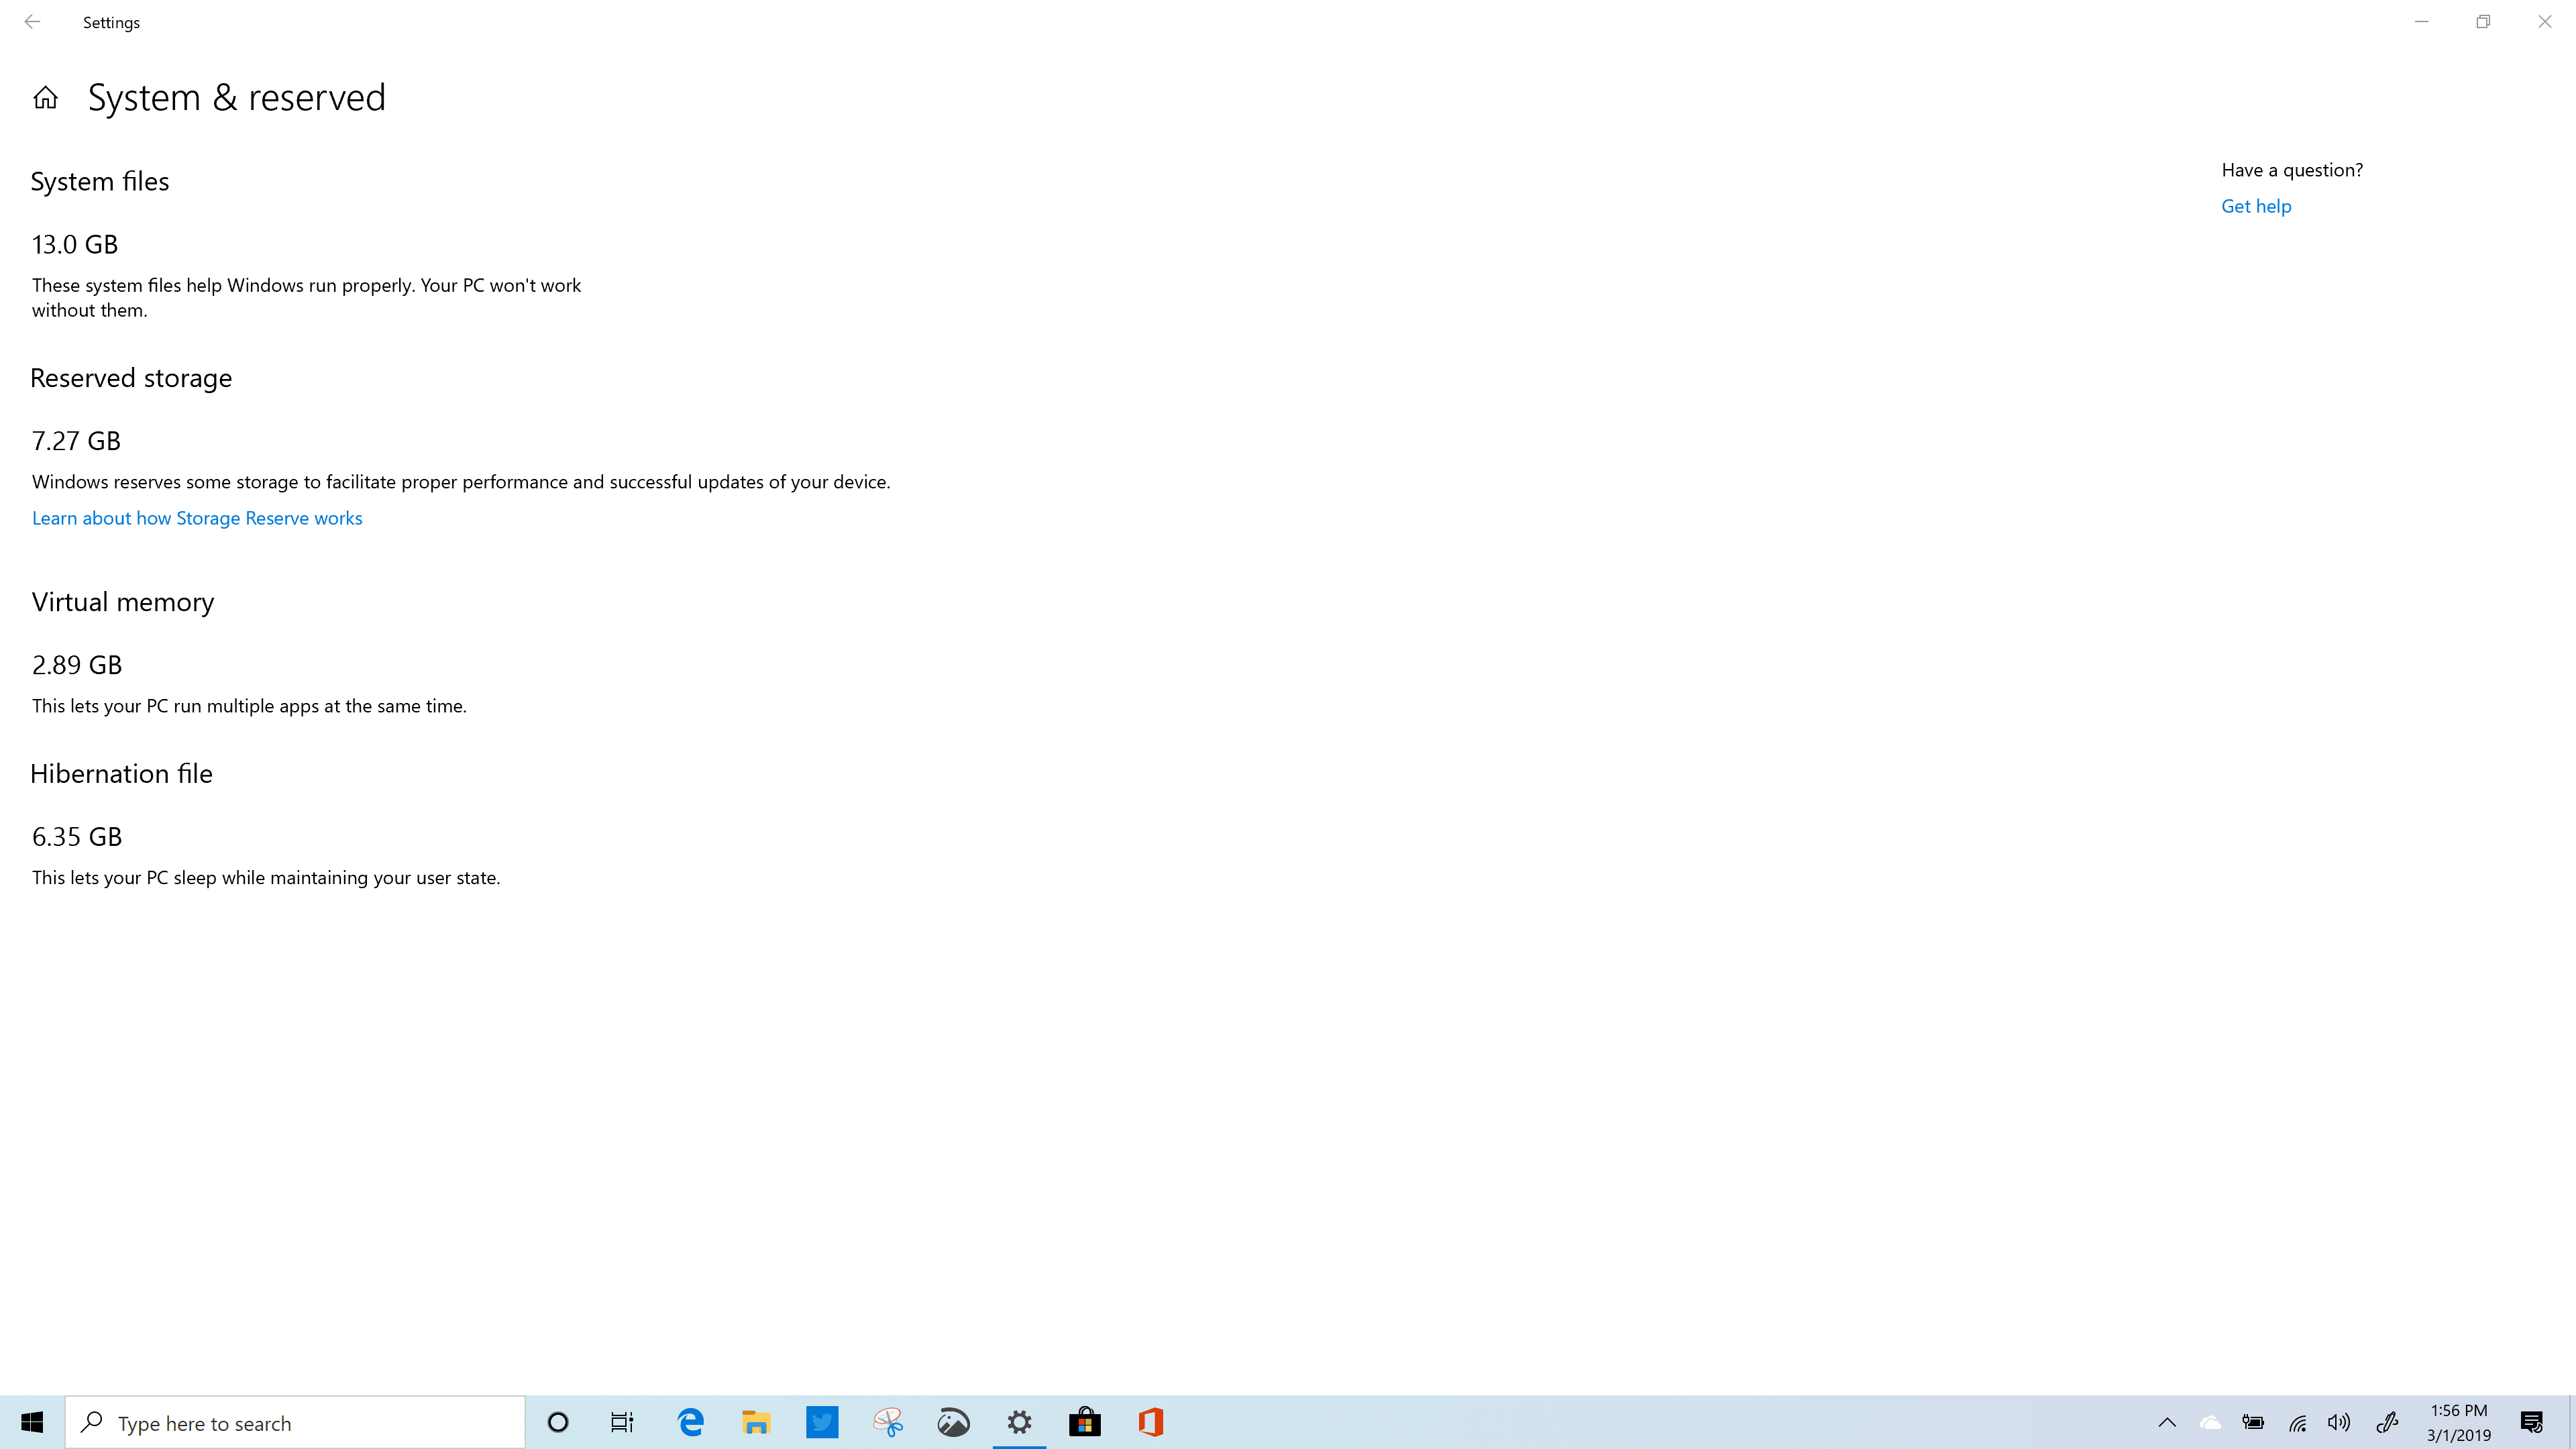 windows 10 (19H1) Reserved Storage - x360 Spectre